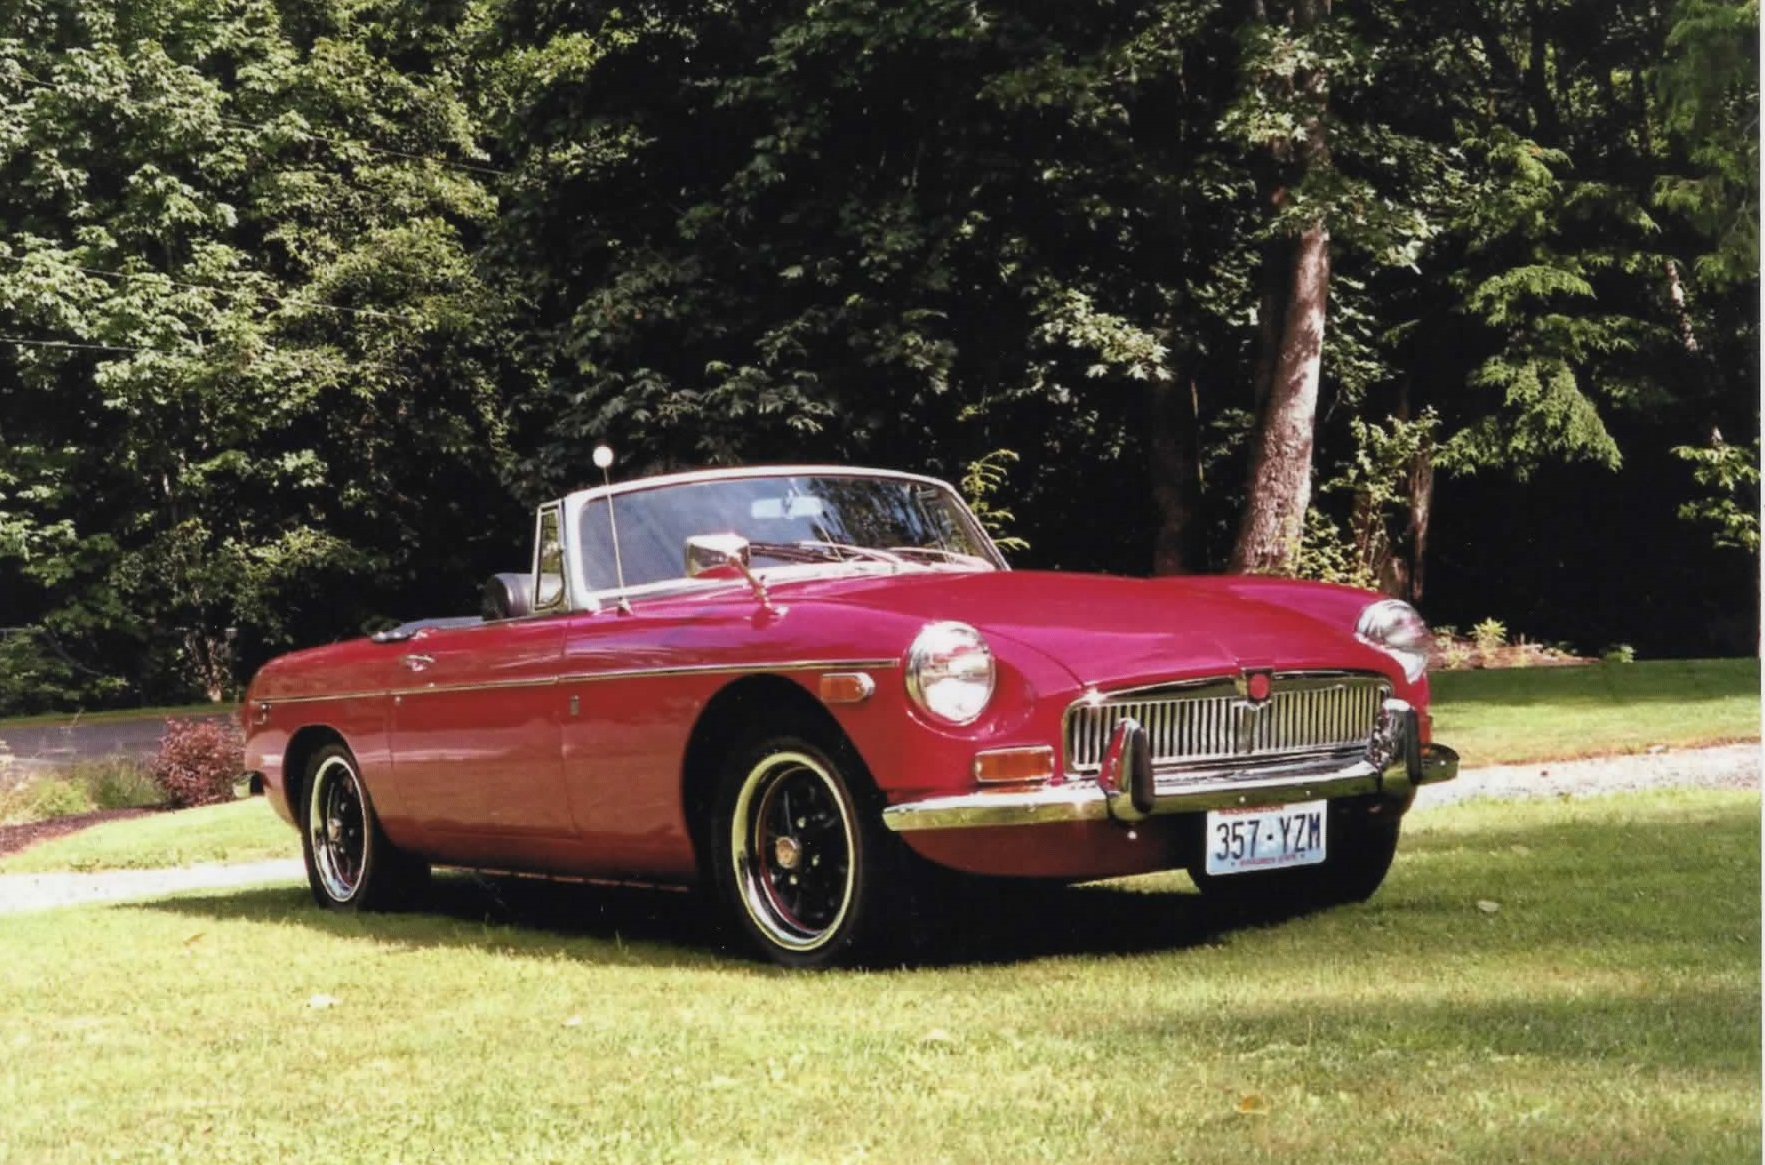 1971 MGB - $14,000